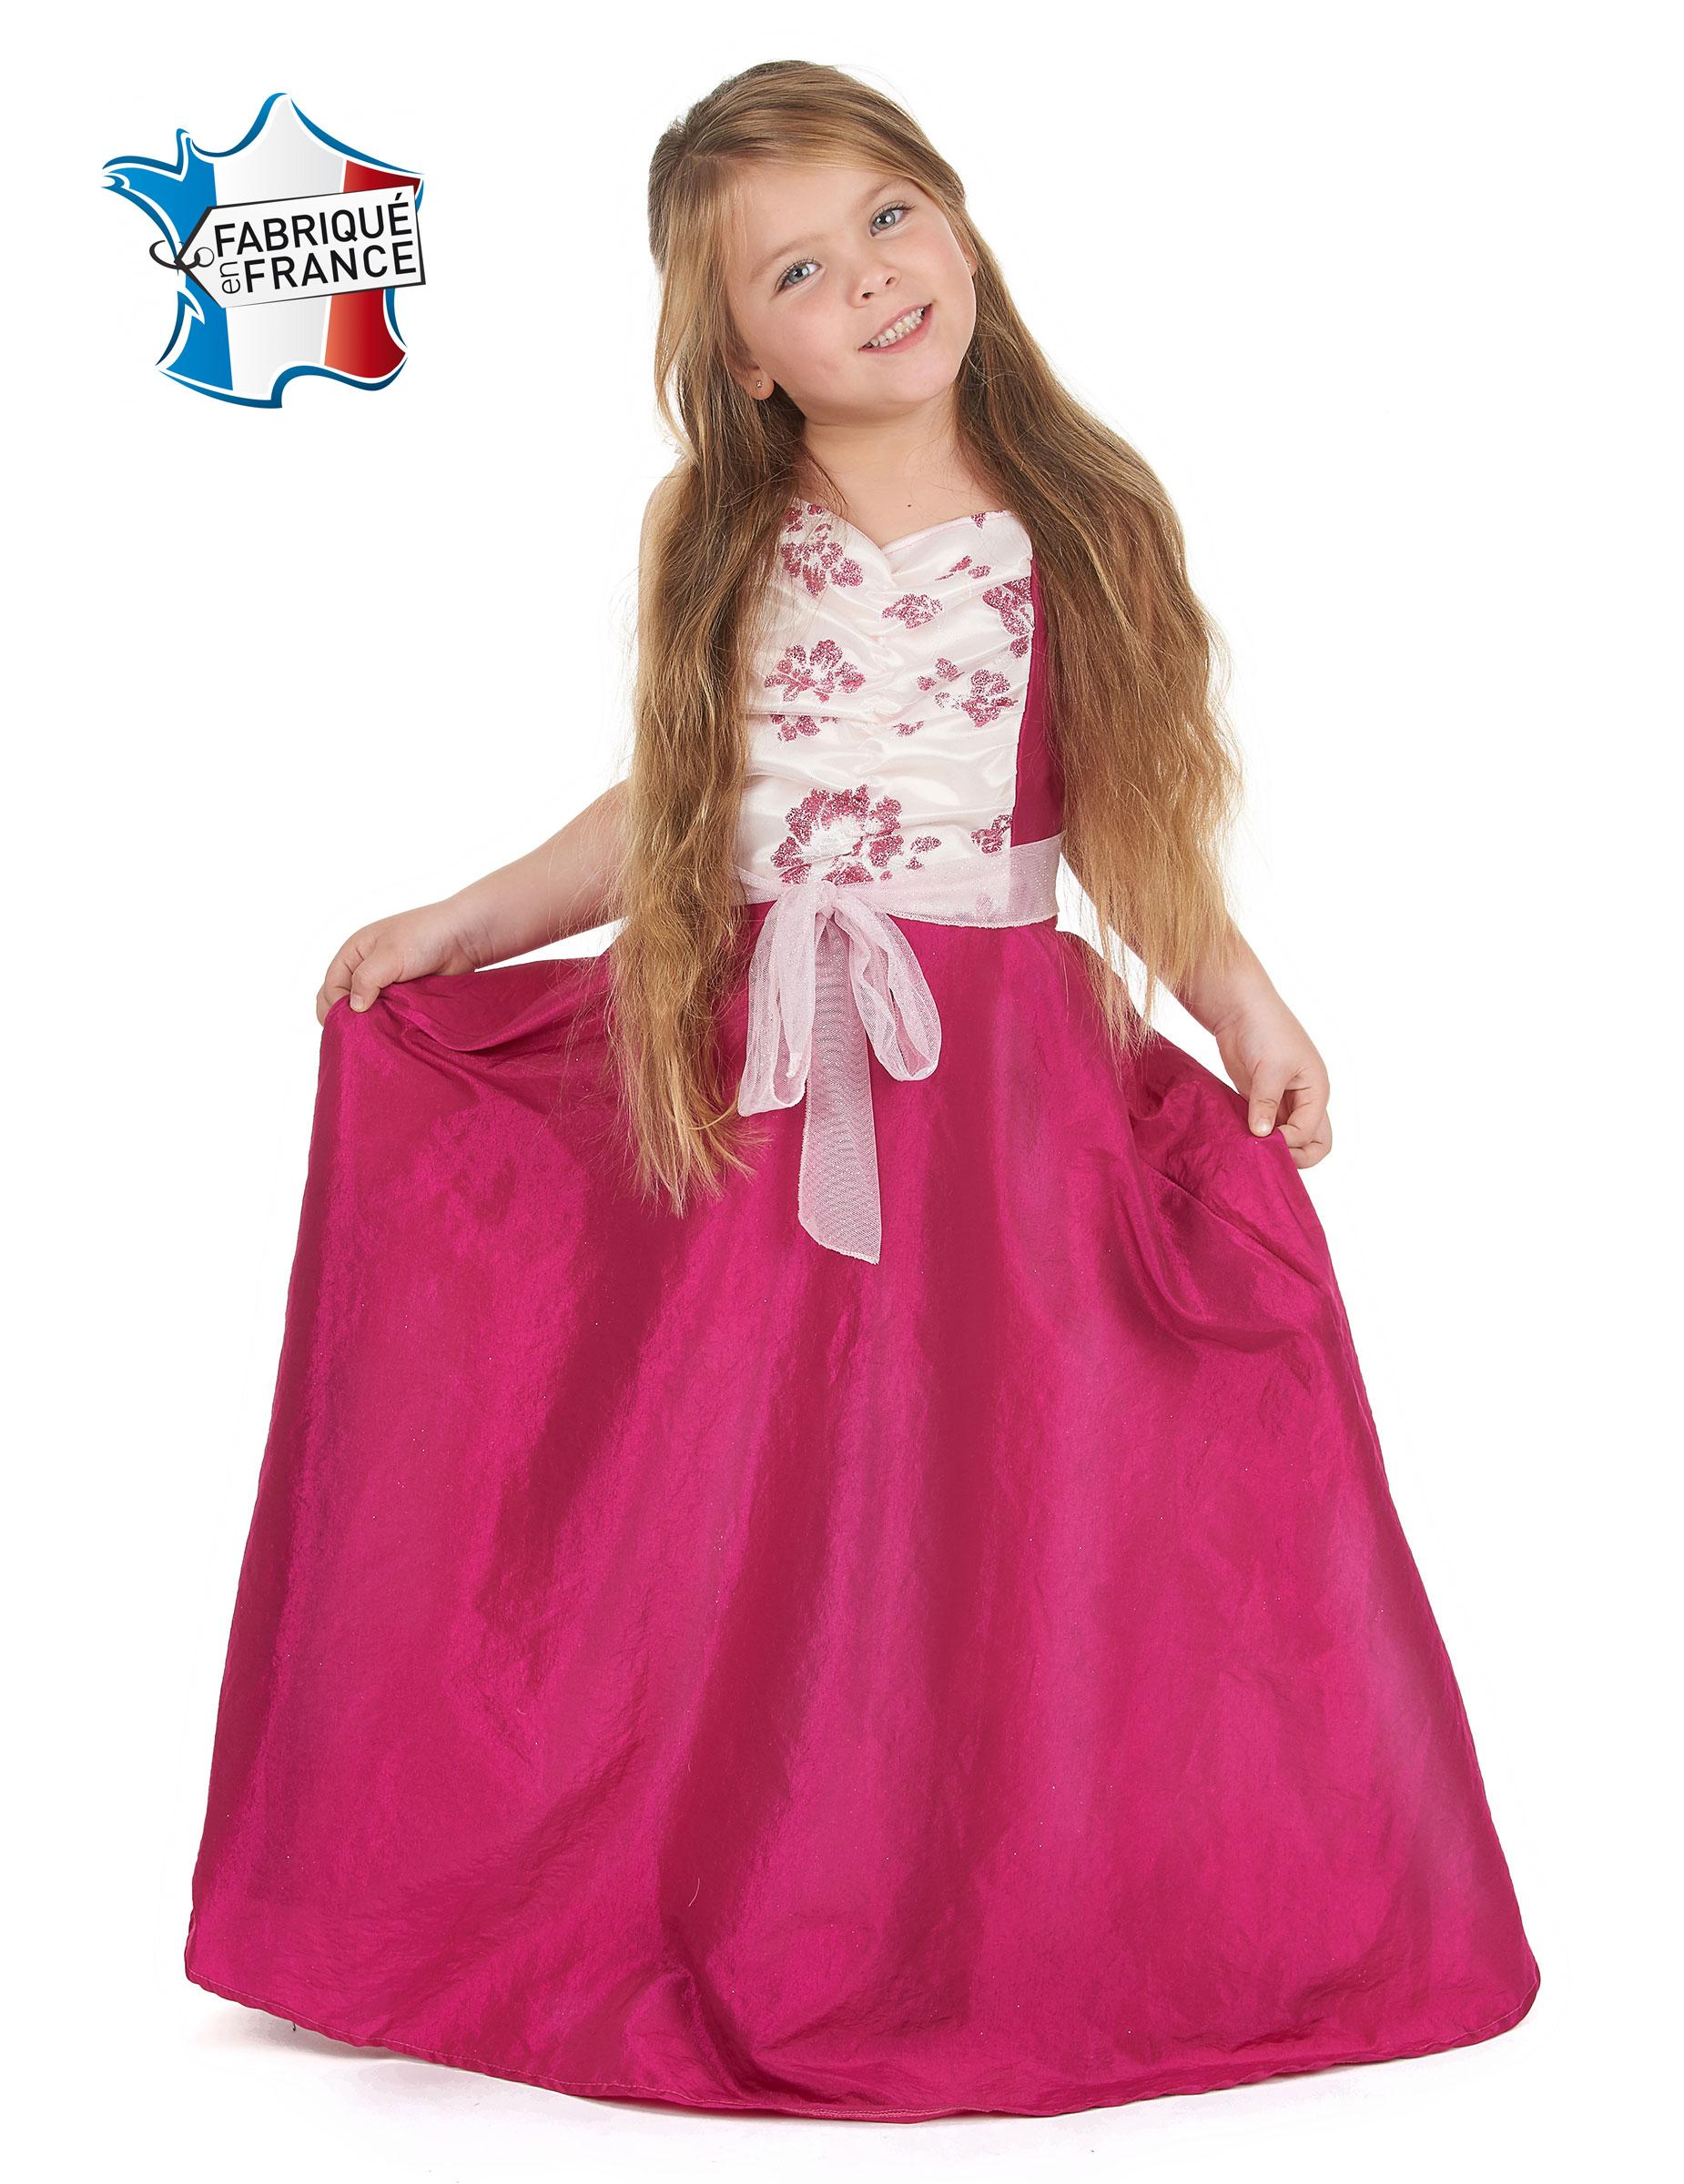 edles ballkleid kinderkostüm , günstige faschings kostüme